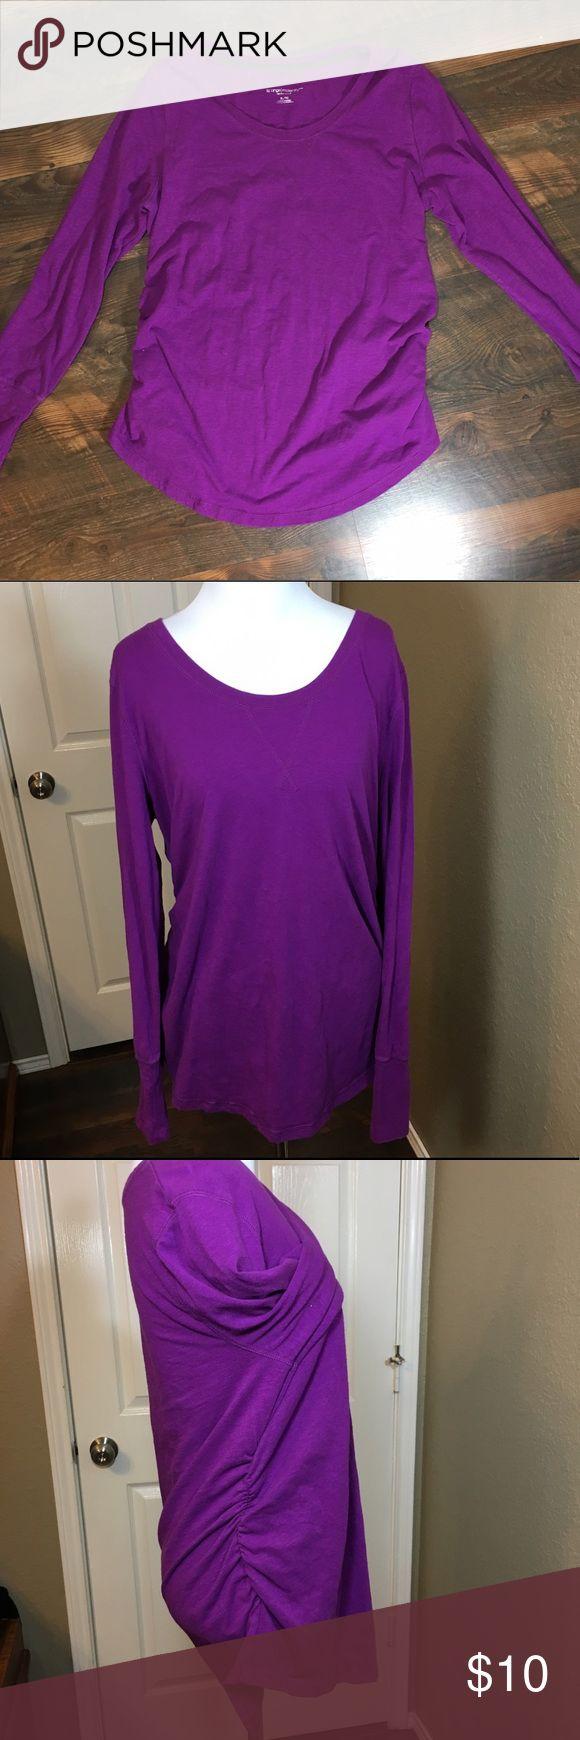 "Liz Lange maternity purple long sleeve top XL Ruched sides. Bust 21"", sleeve 25"", length 28"" Liz Lange for Target Tops Tees - Long Sleeve"